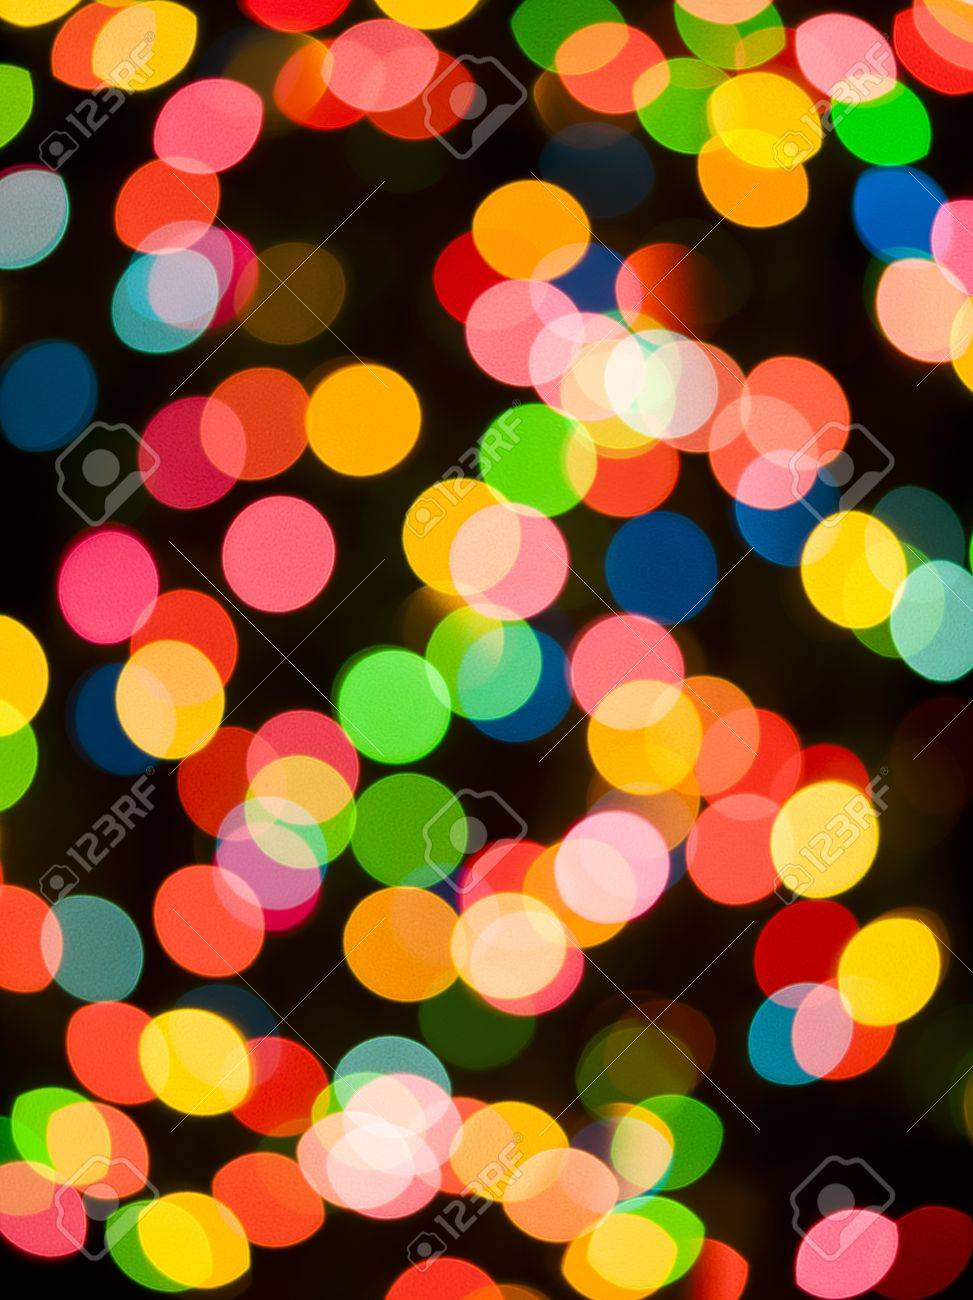 Colorful defocussed light at night. Stock Photo - 15543098